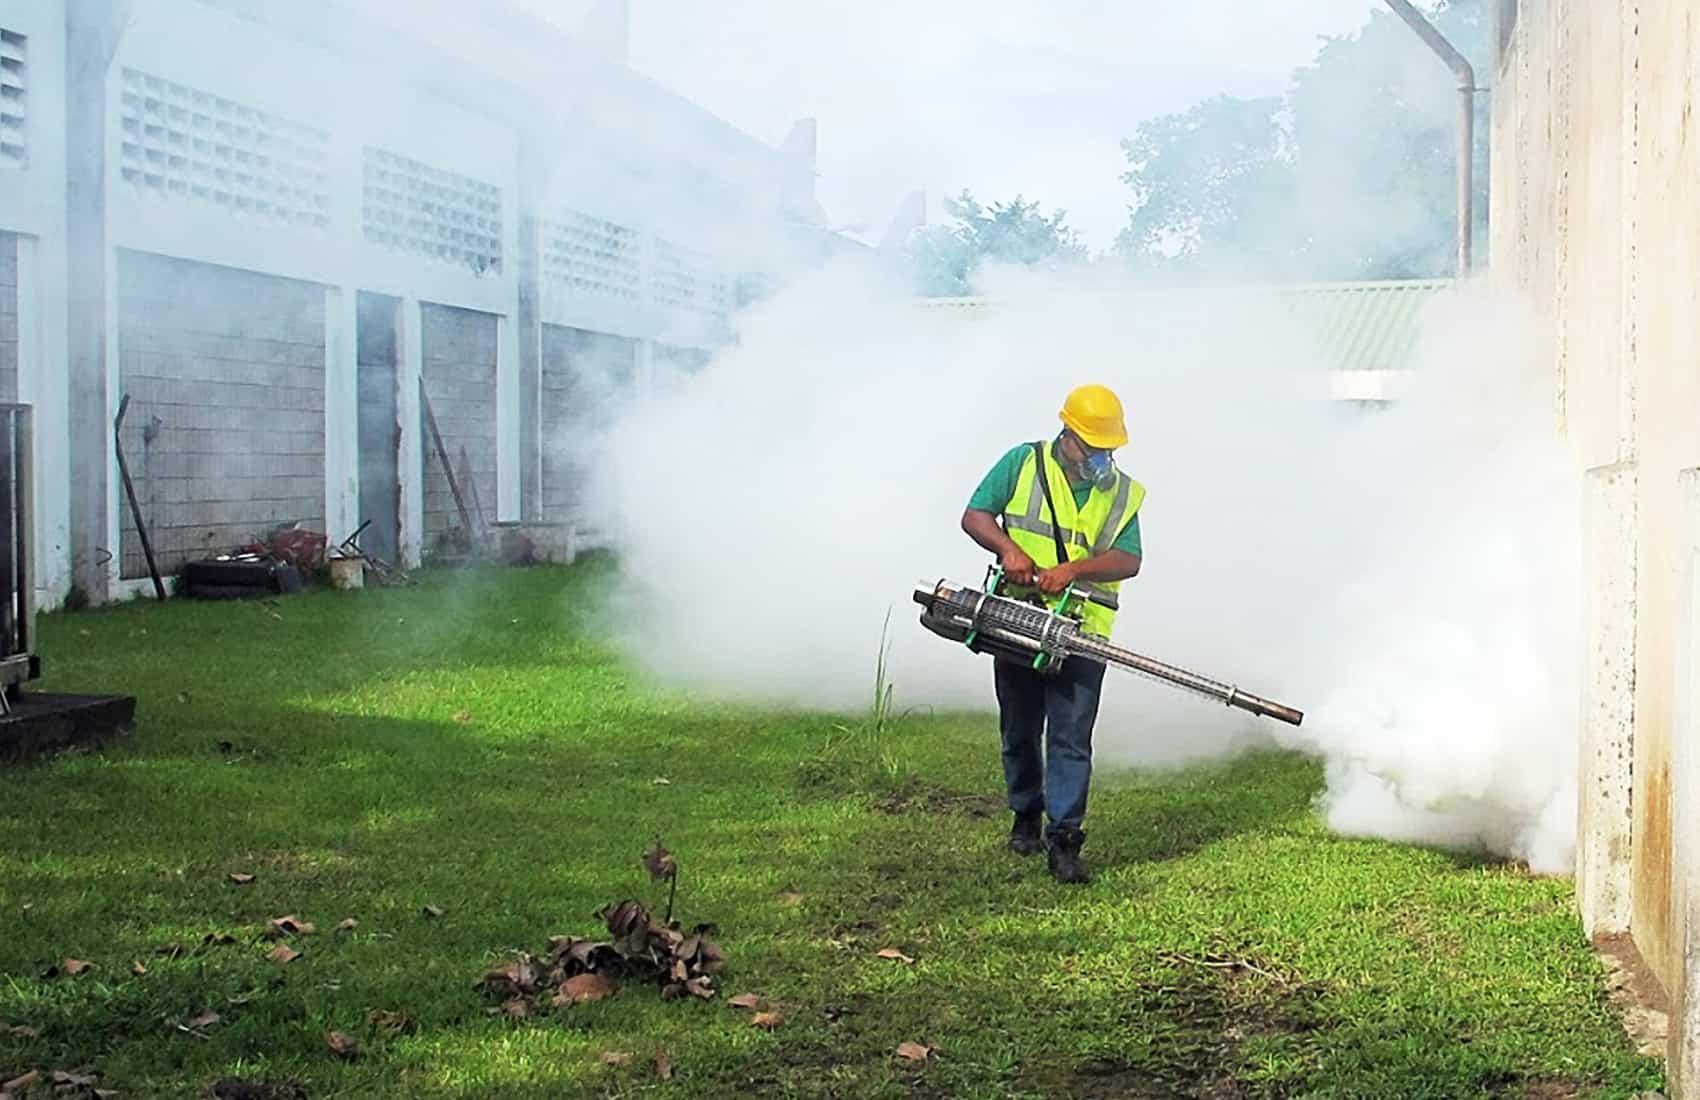 Fumigation against Zika in Guanacaste, Feb. 2016